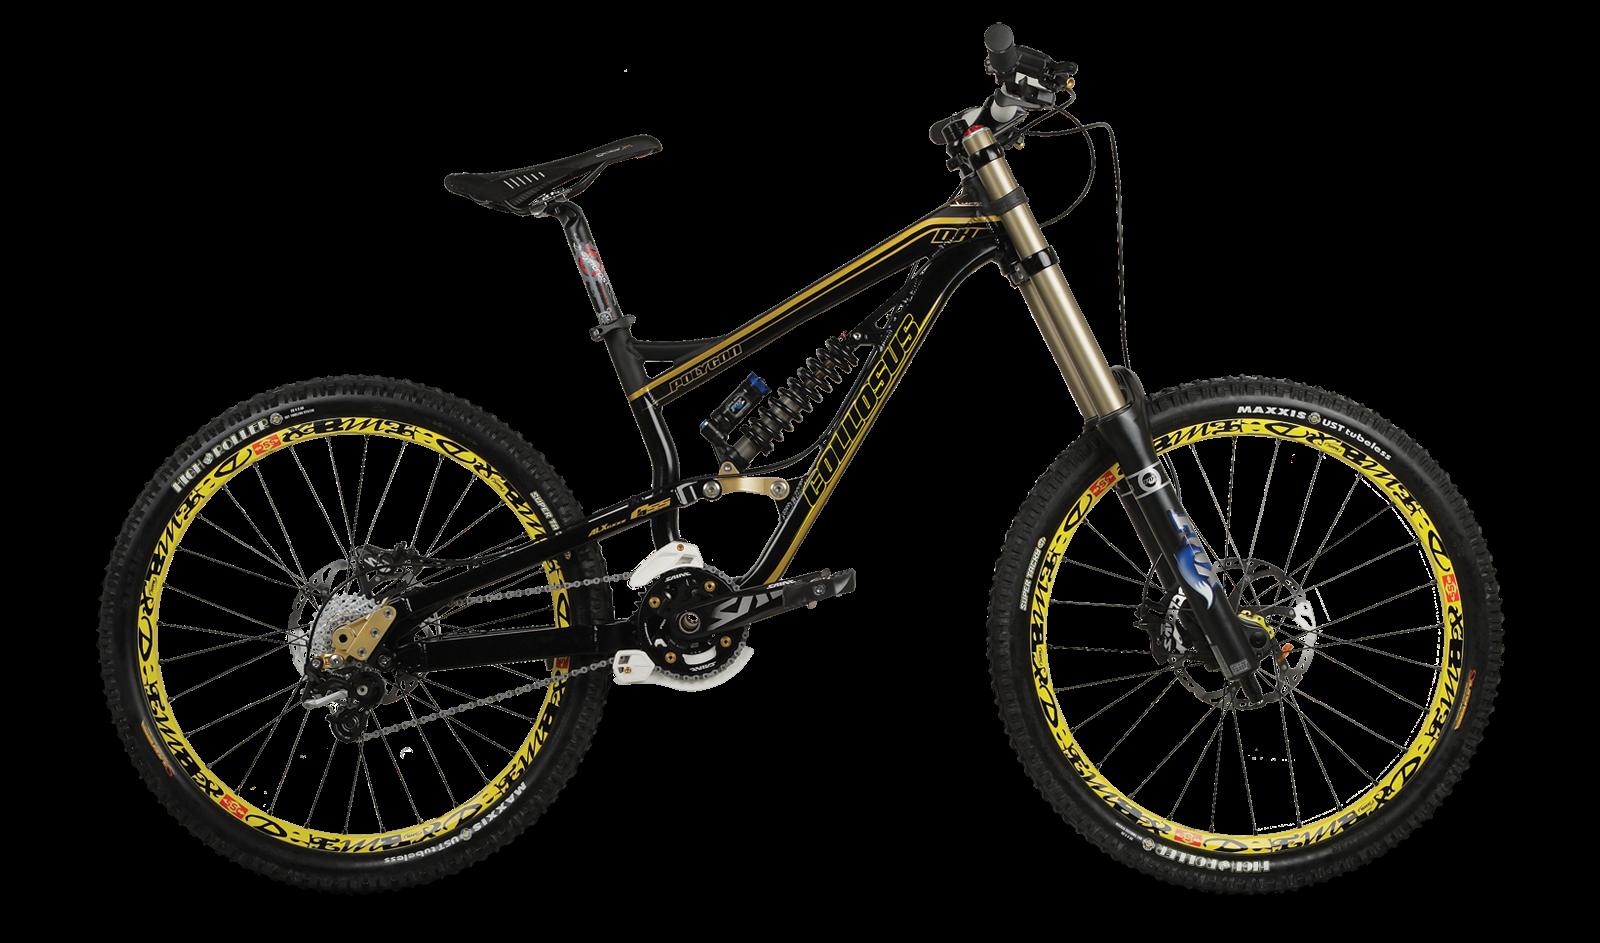 Daftar Harga Sepeda Gunung MTB